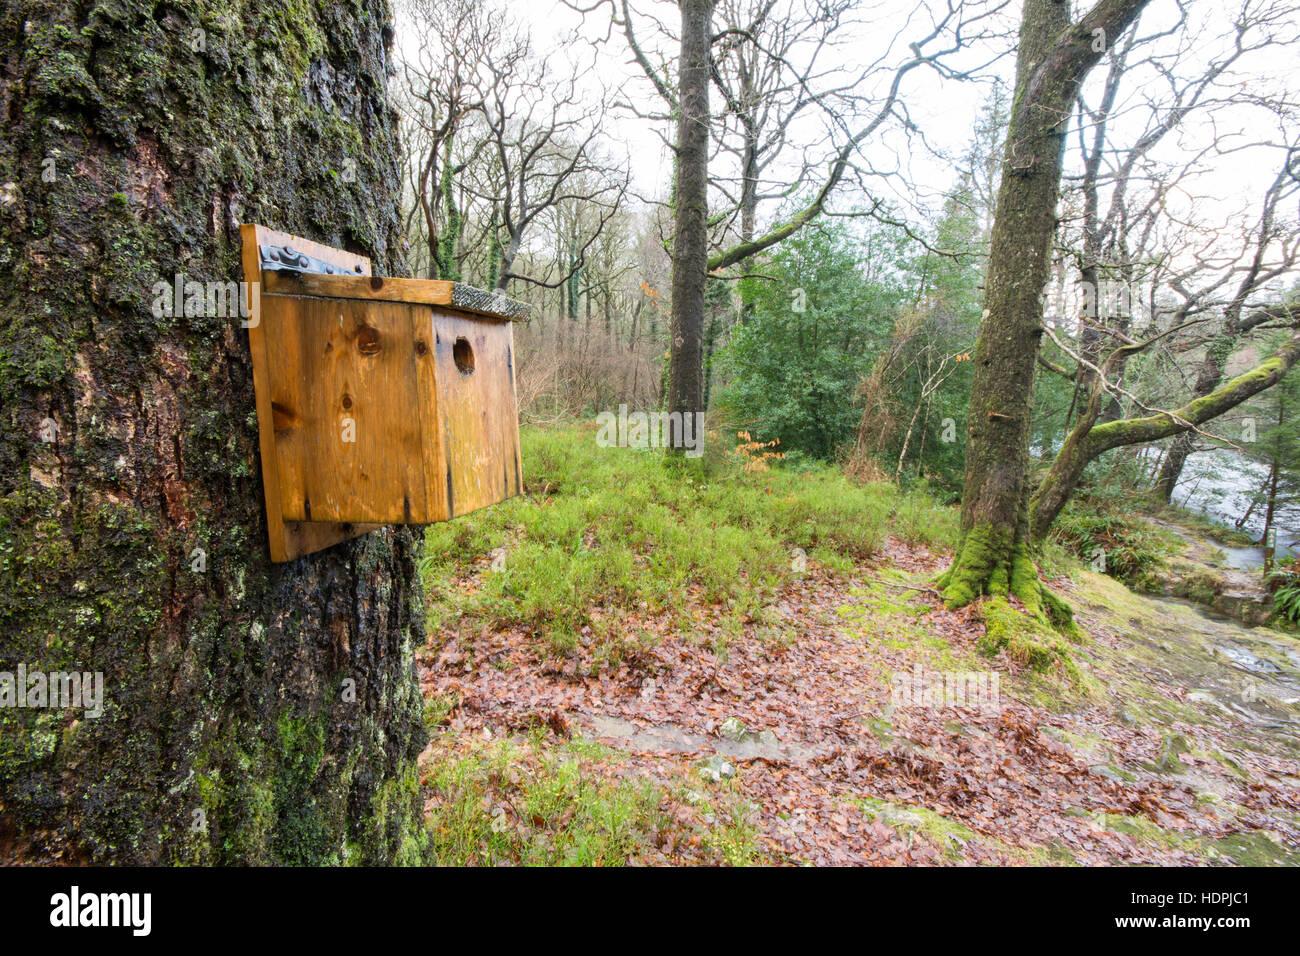 Bird nesting box on a tree in damp woodland - Stock Image